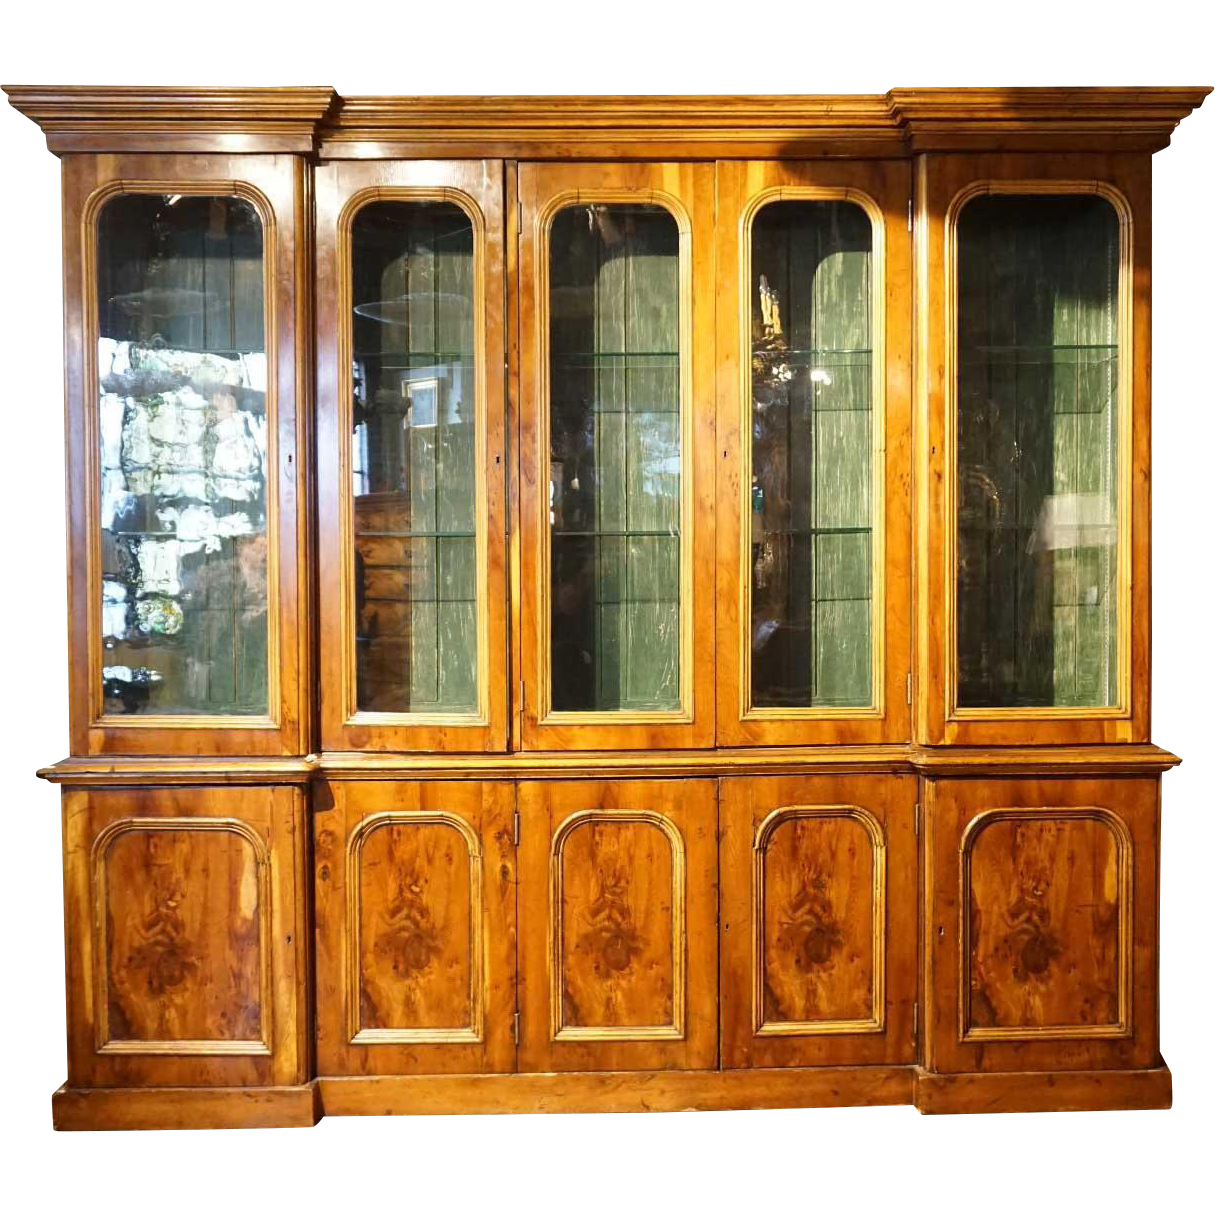 Large English Pine and Yew Wood Veneer Glazed Door Bookcase